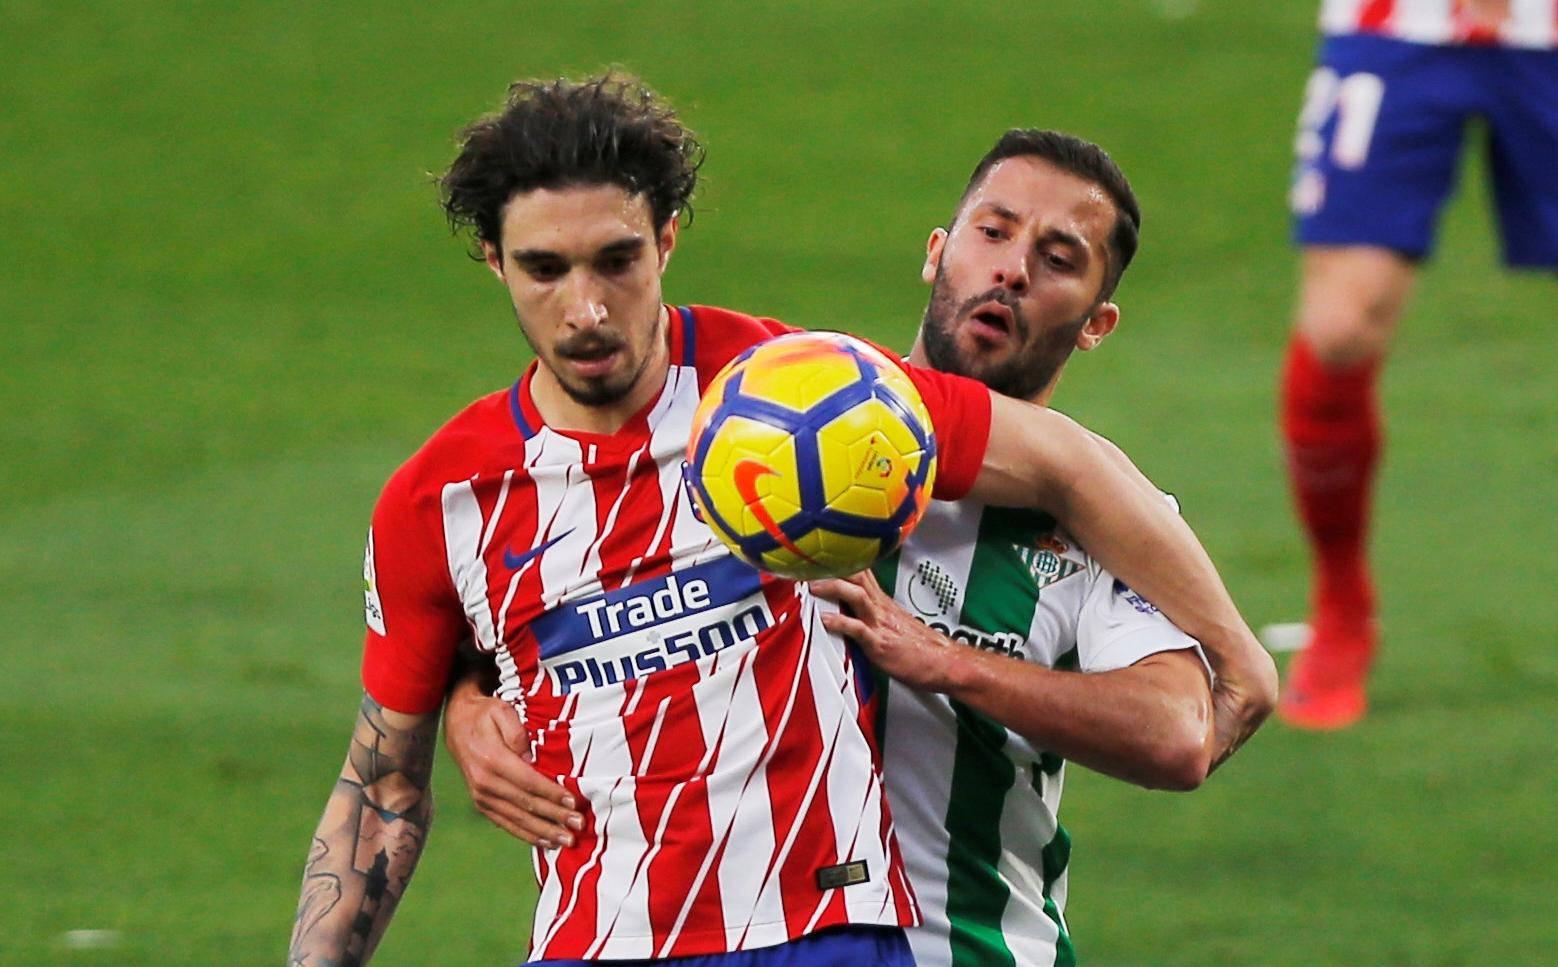 La Liga Santander - Real Betis vs Atletico Madrid